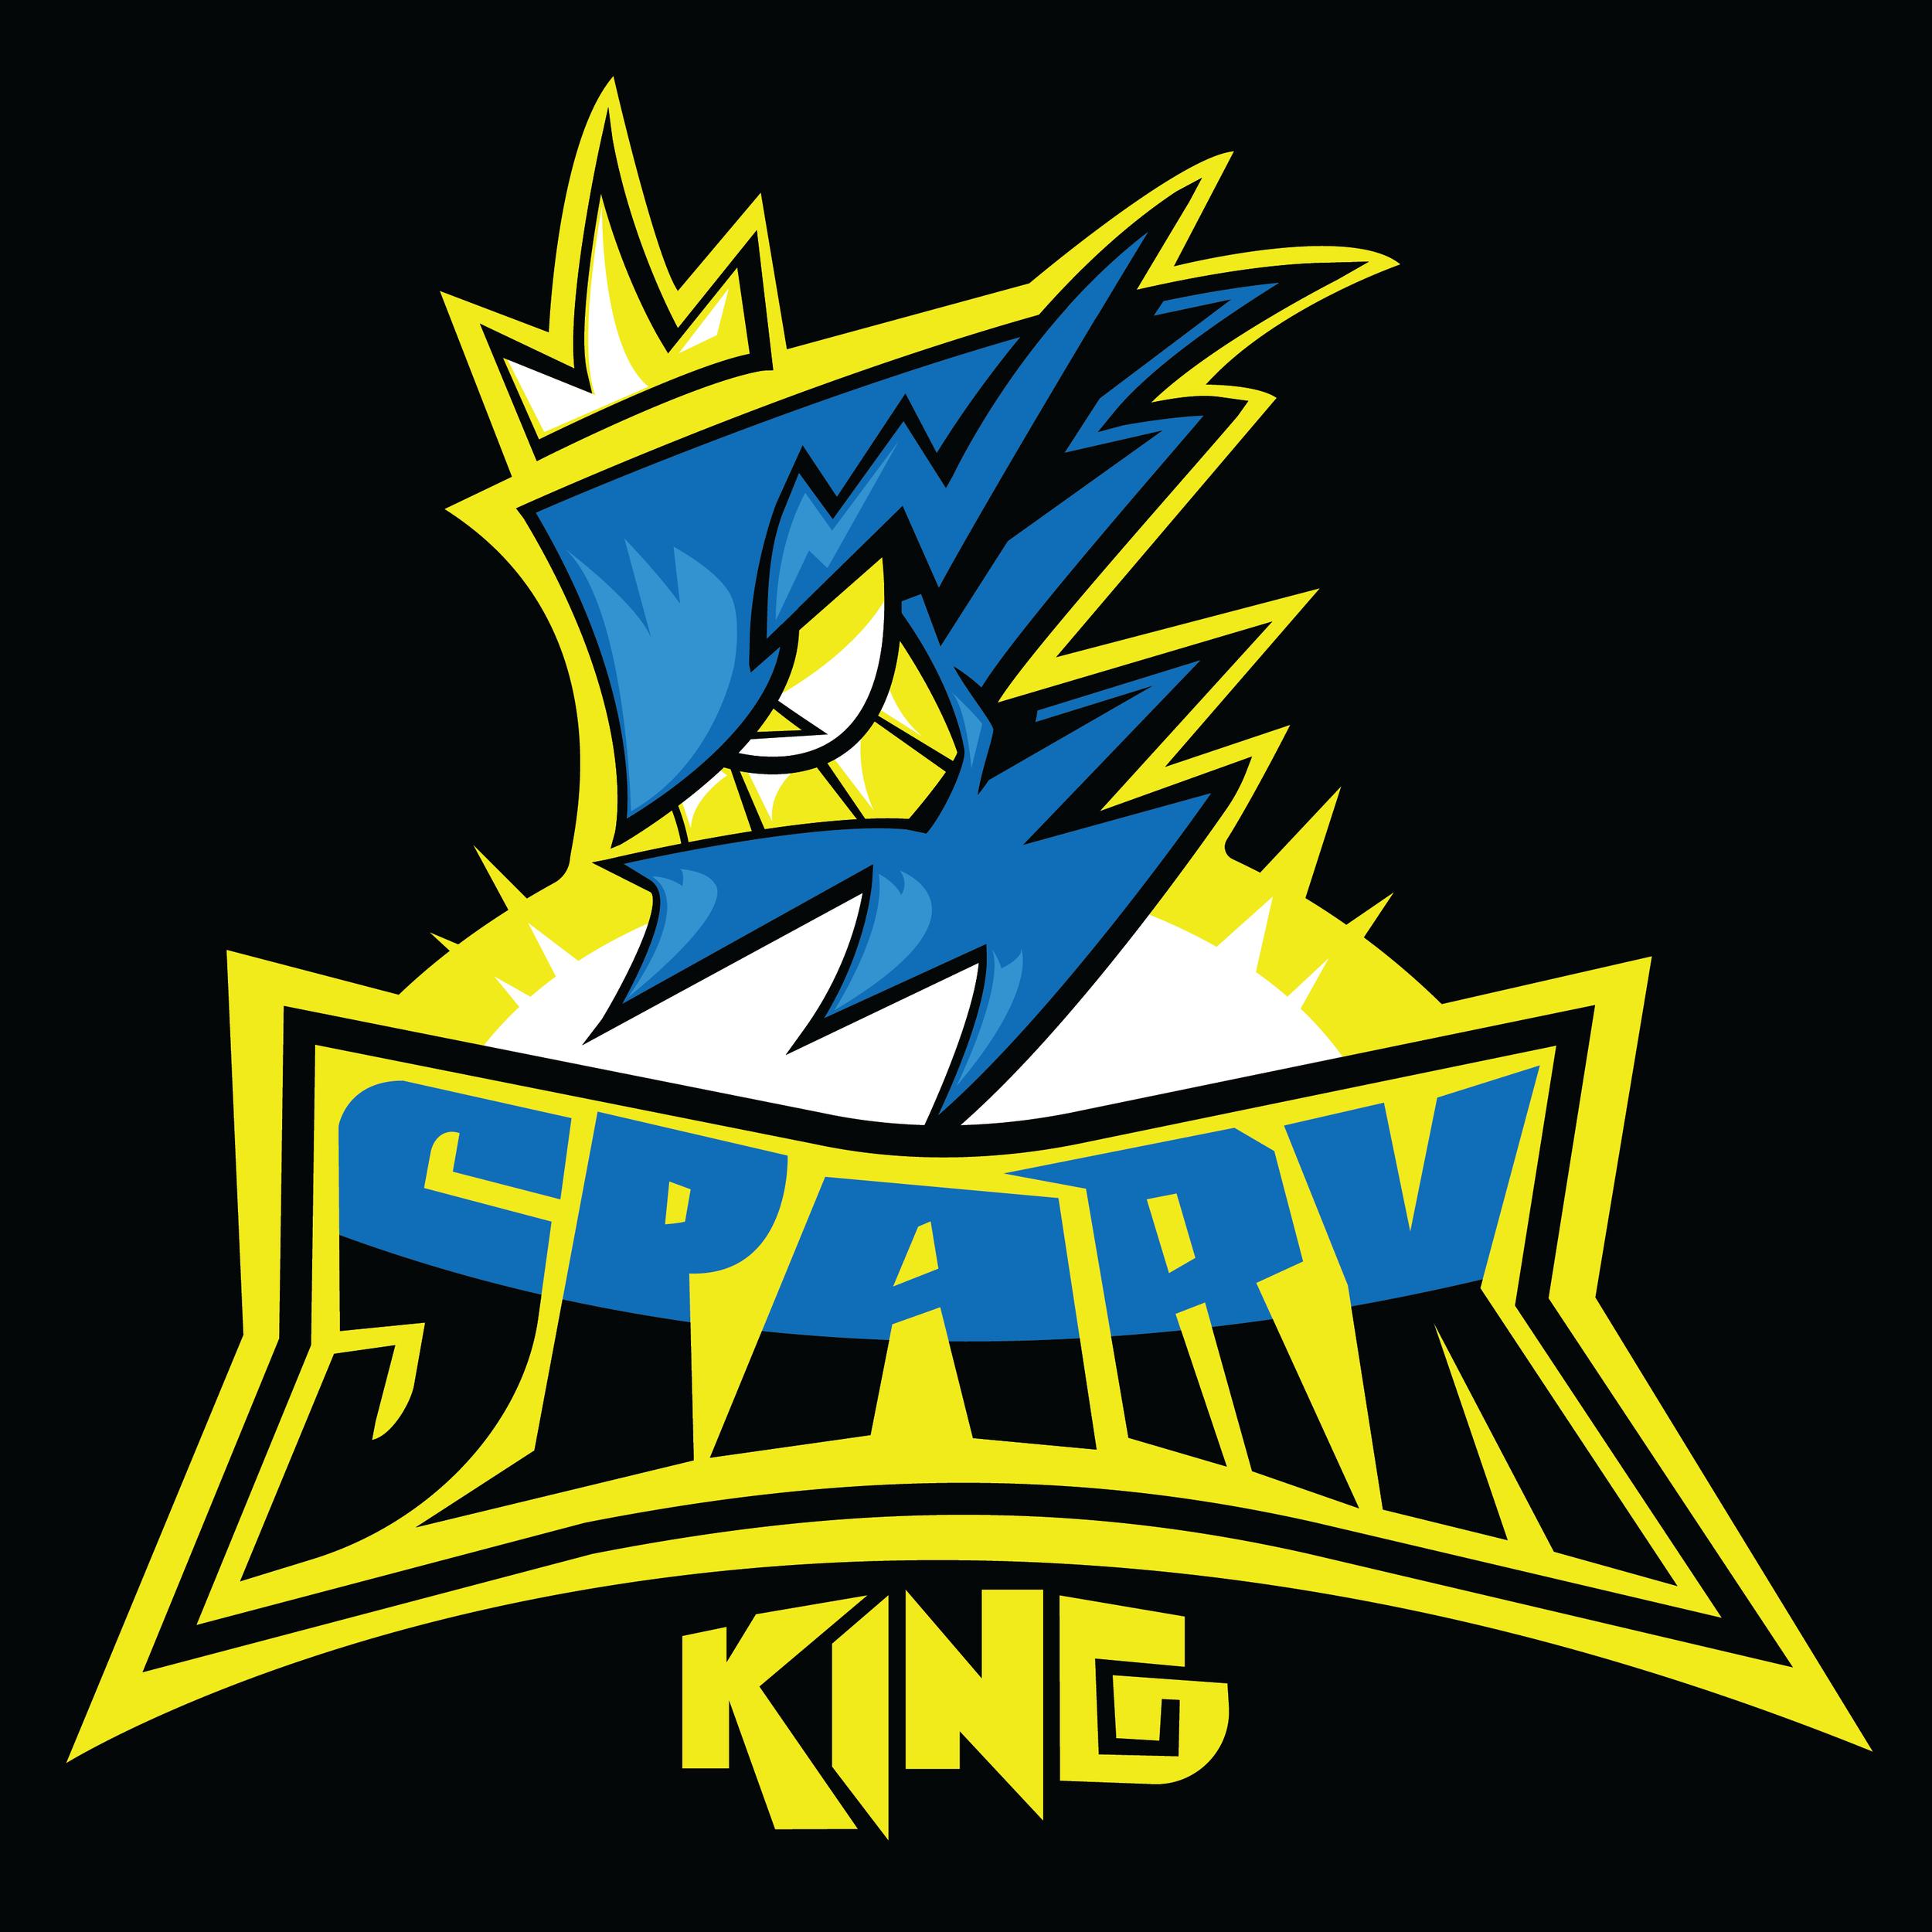 Spark King